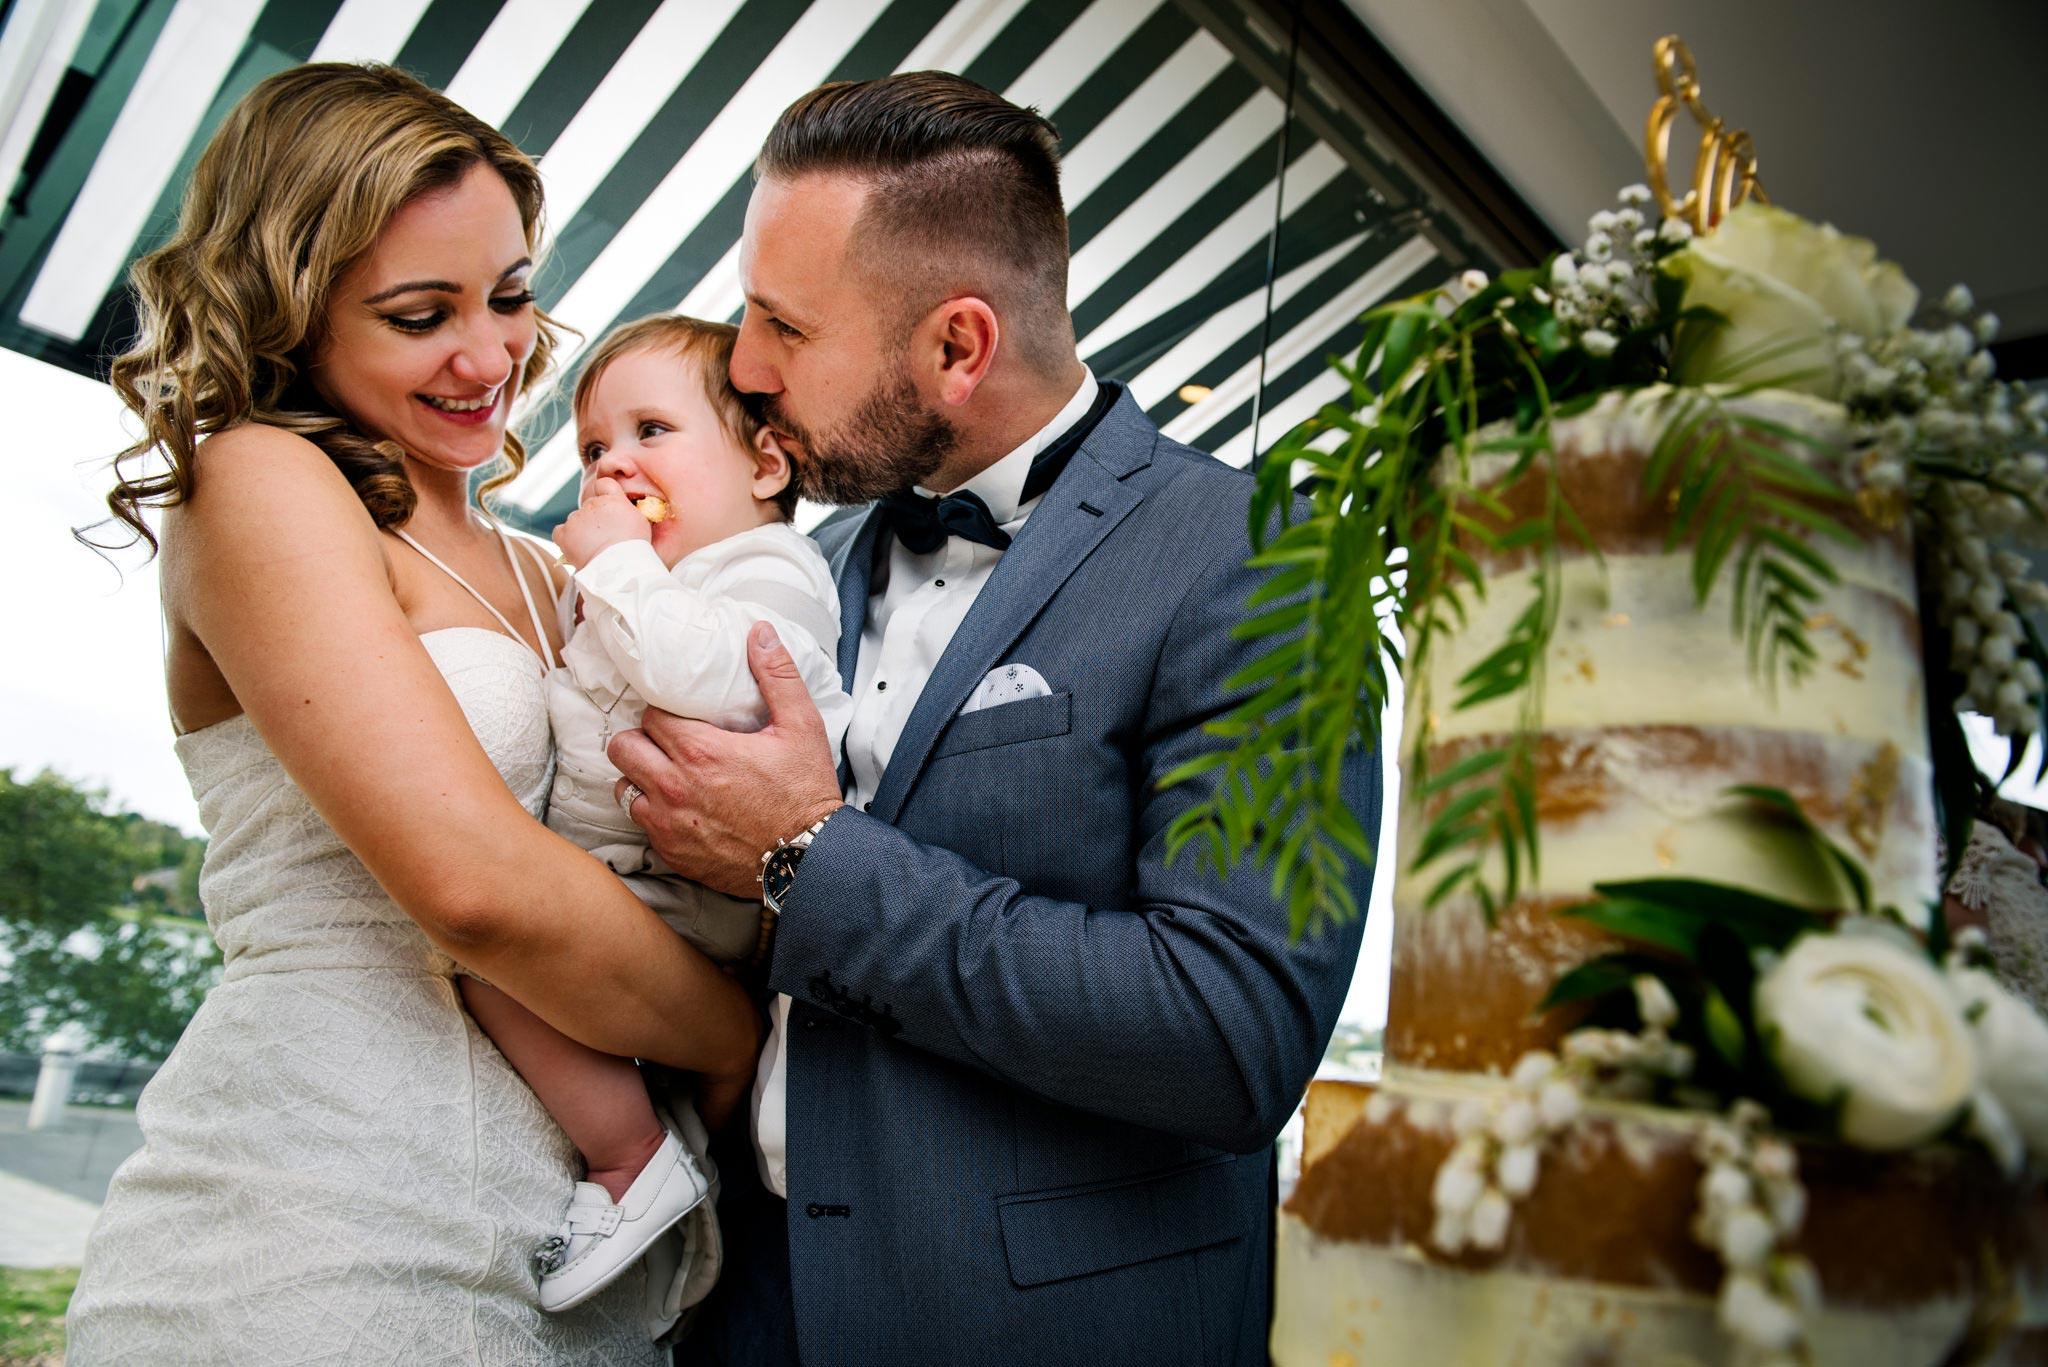 Baby eats christening cake at Oliveto reception